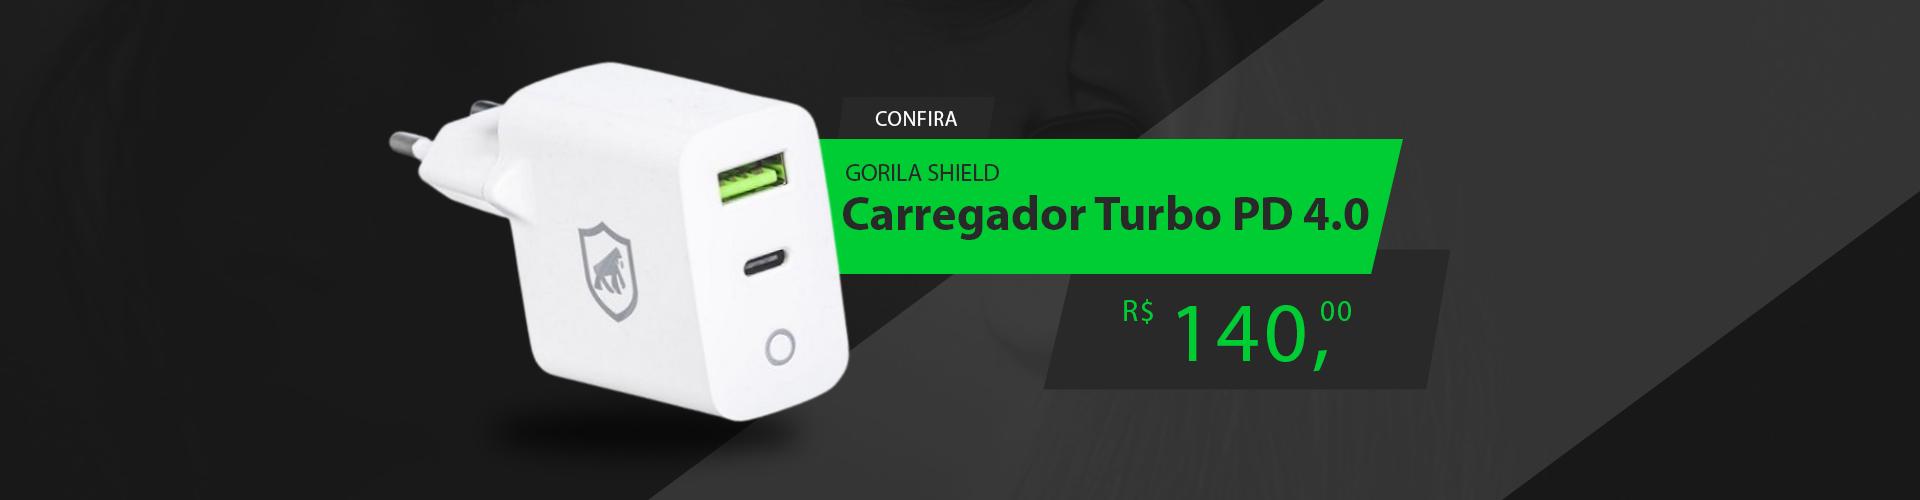 Carregador Turbo Power Delivery QC 4.0